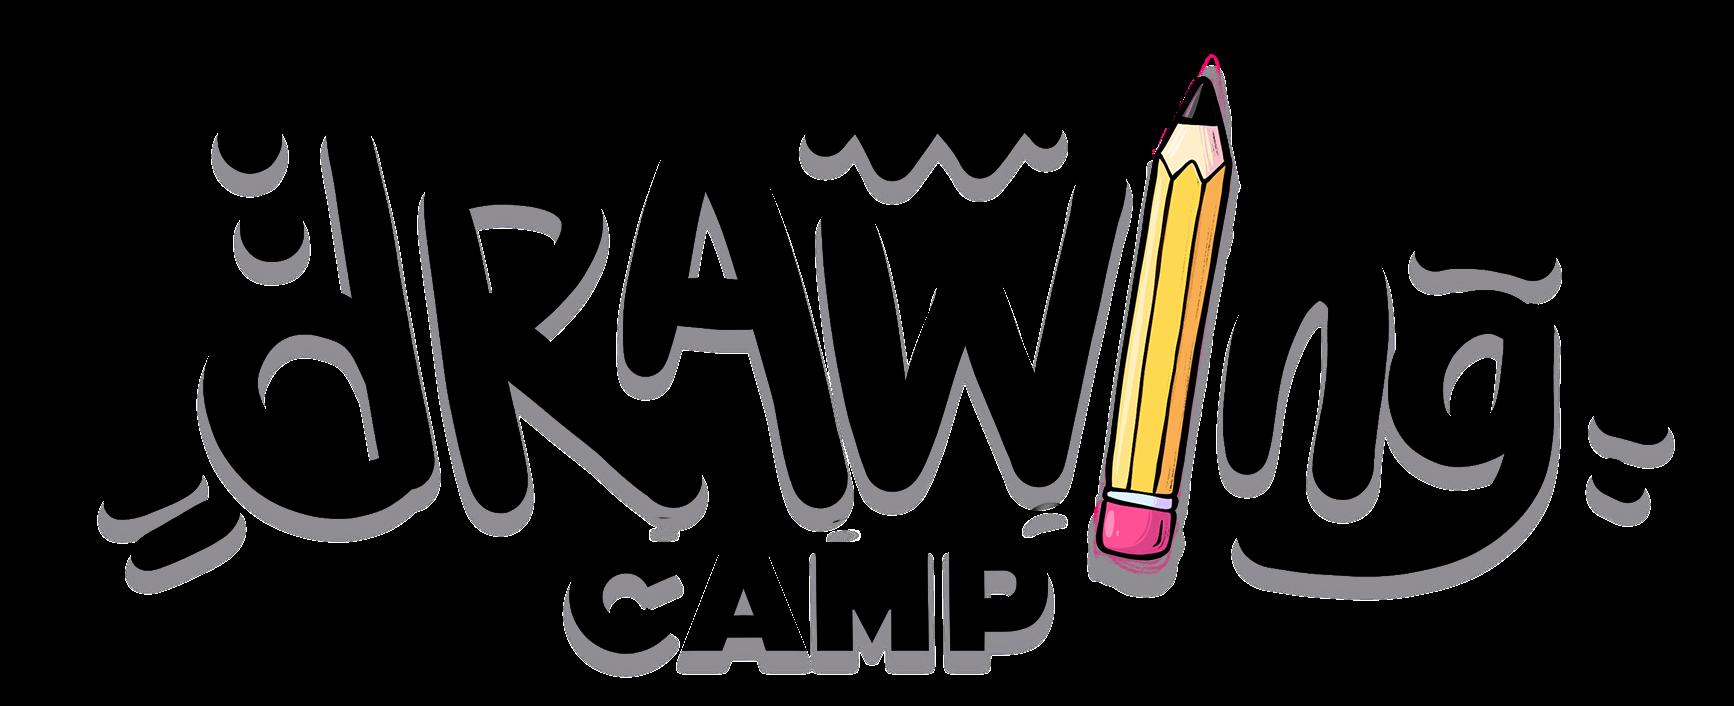 drawing camp